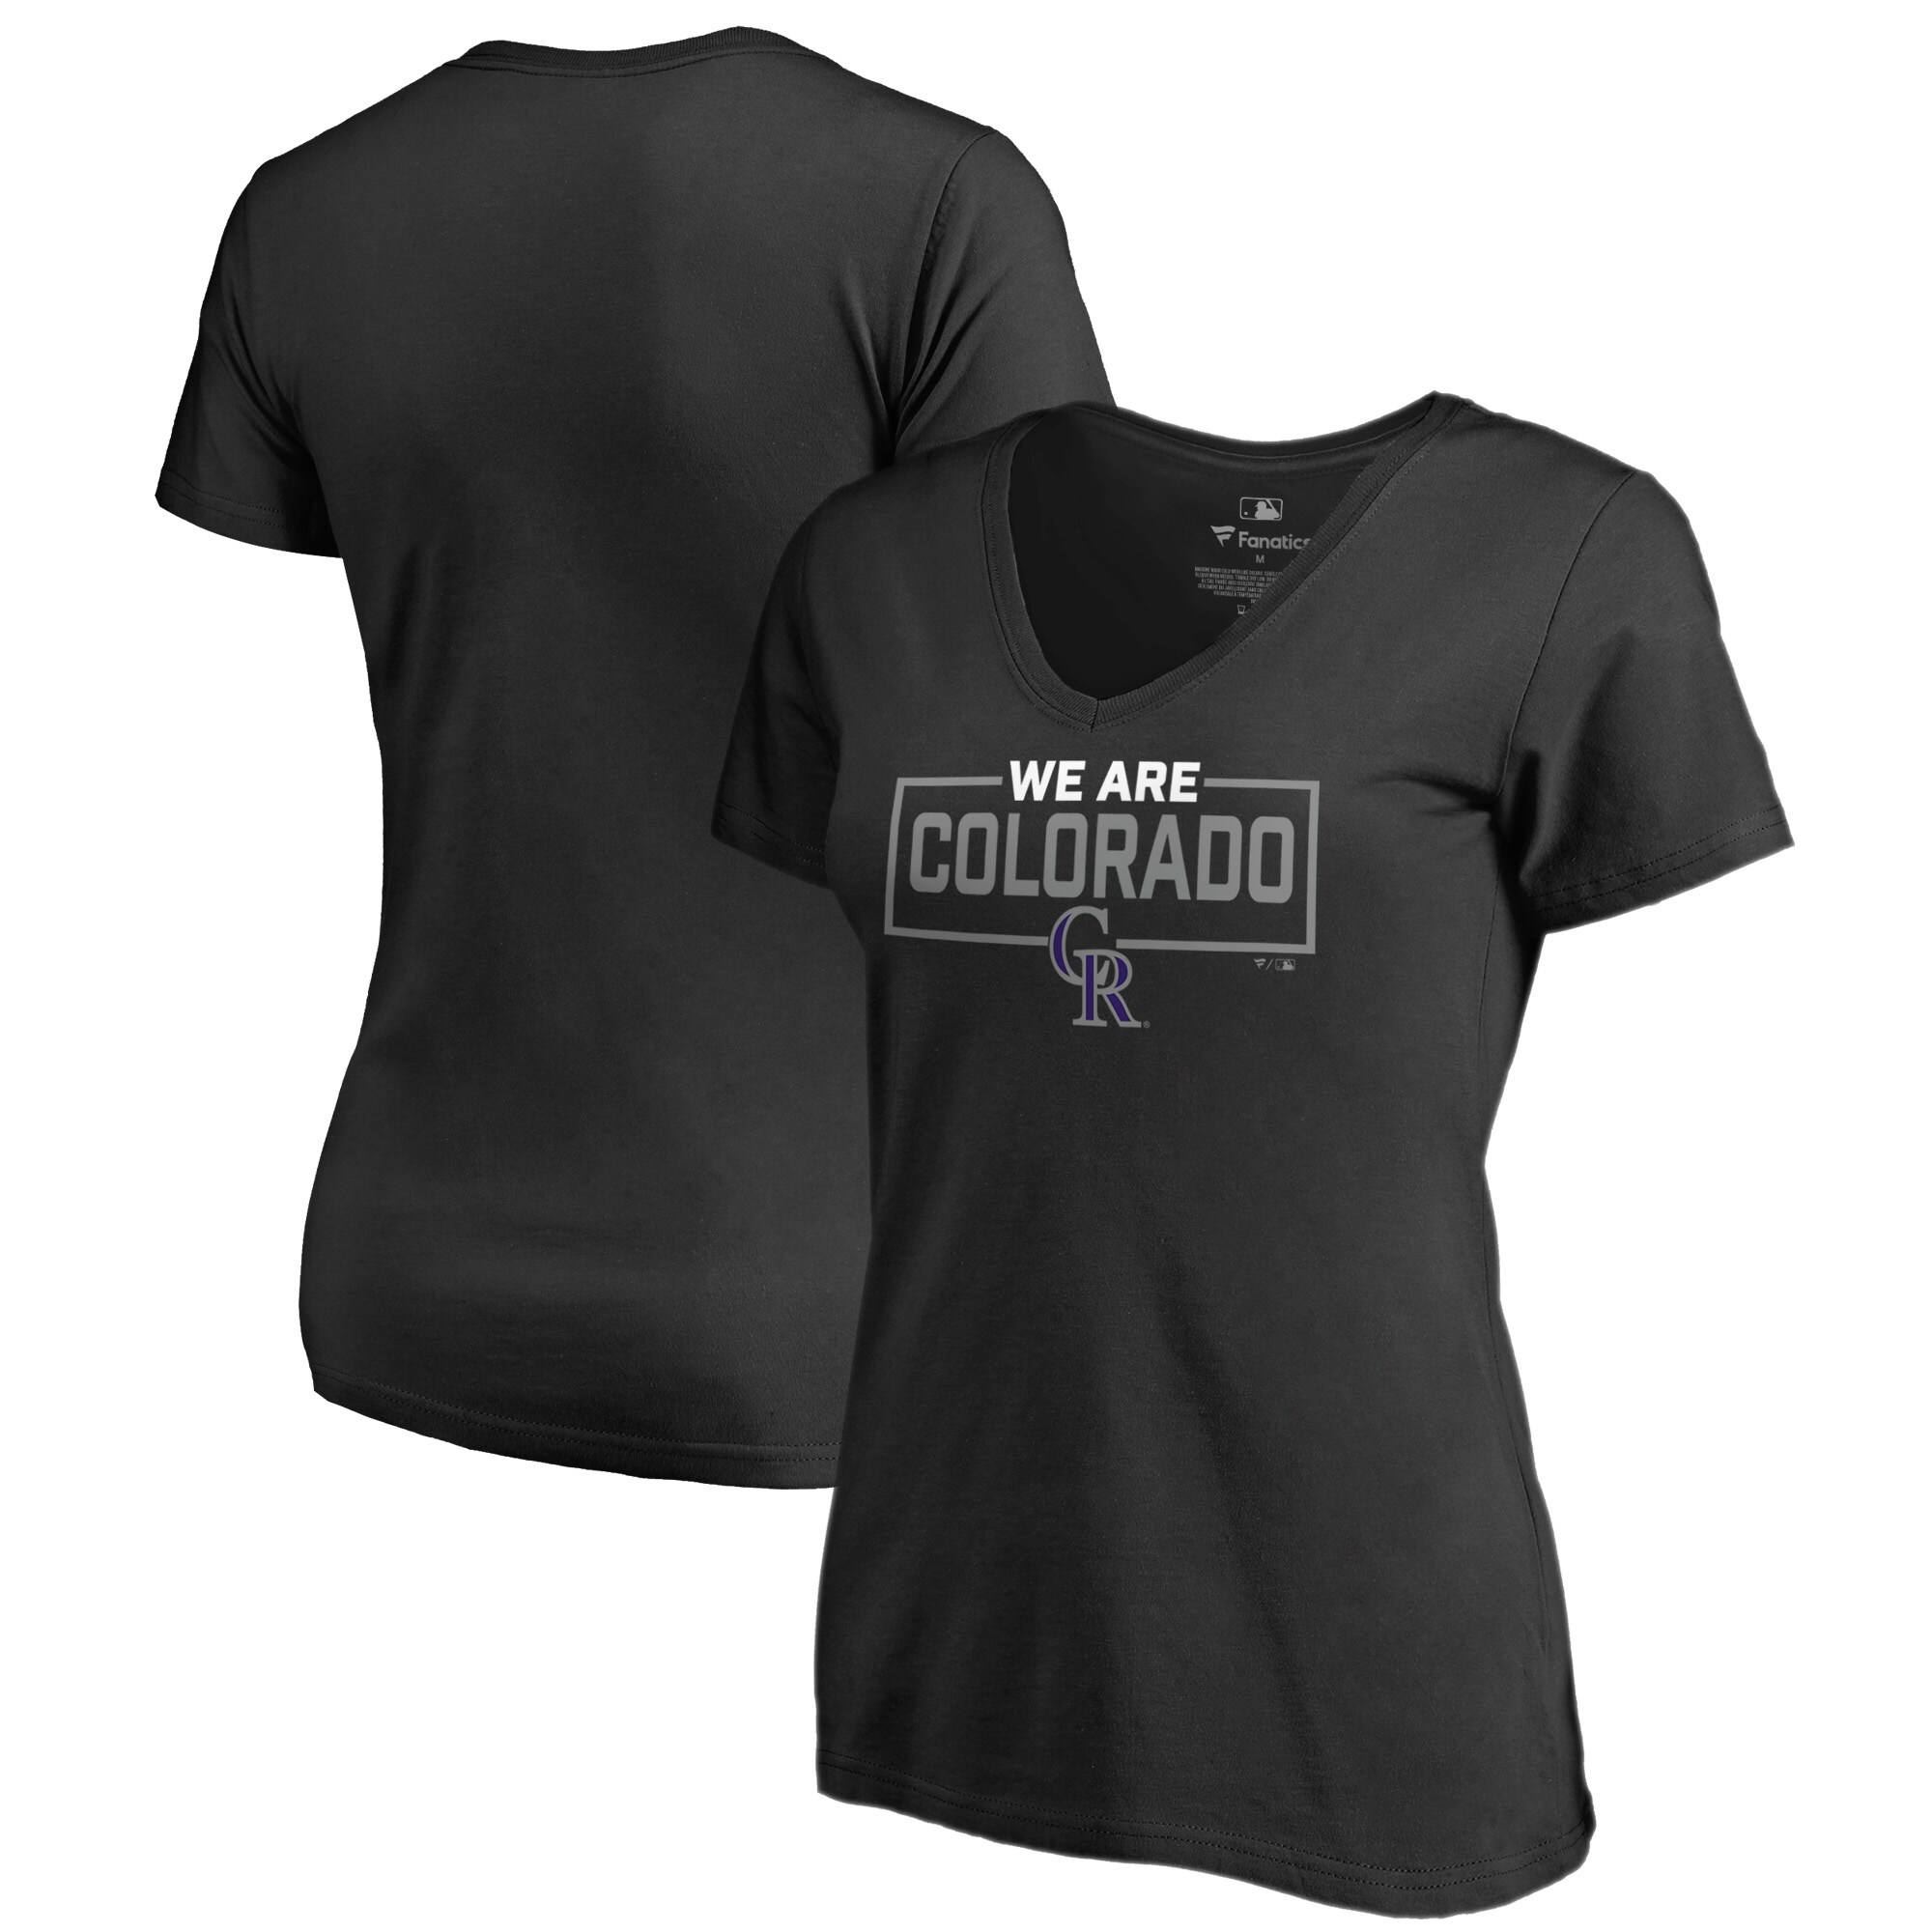 Colorado Rockies Fanatics Branded Women's Plus Size We Are Icon V-Neck T-Shirt - Black